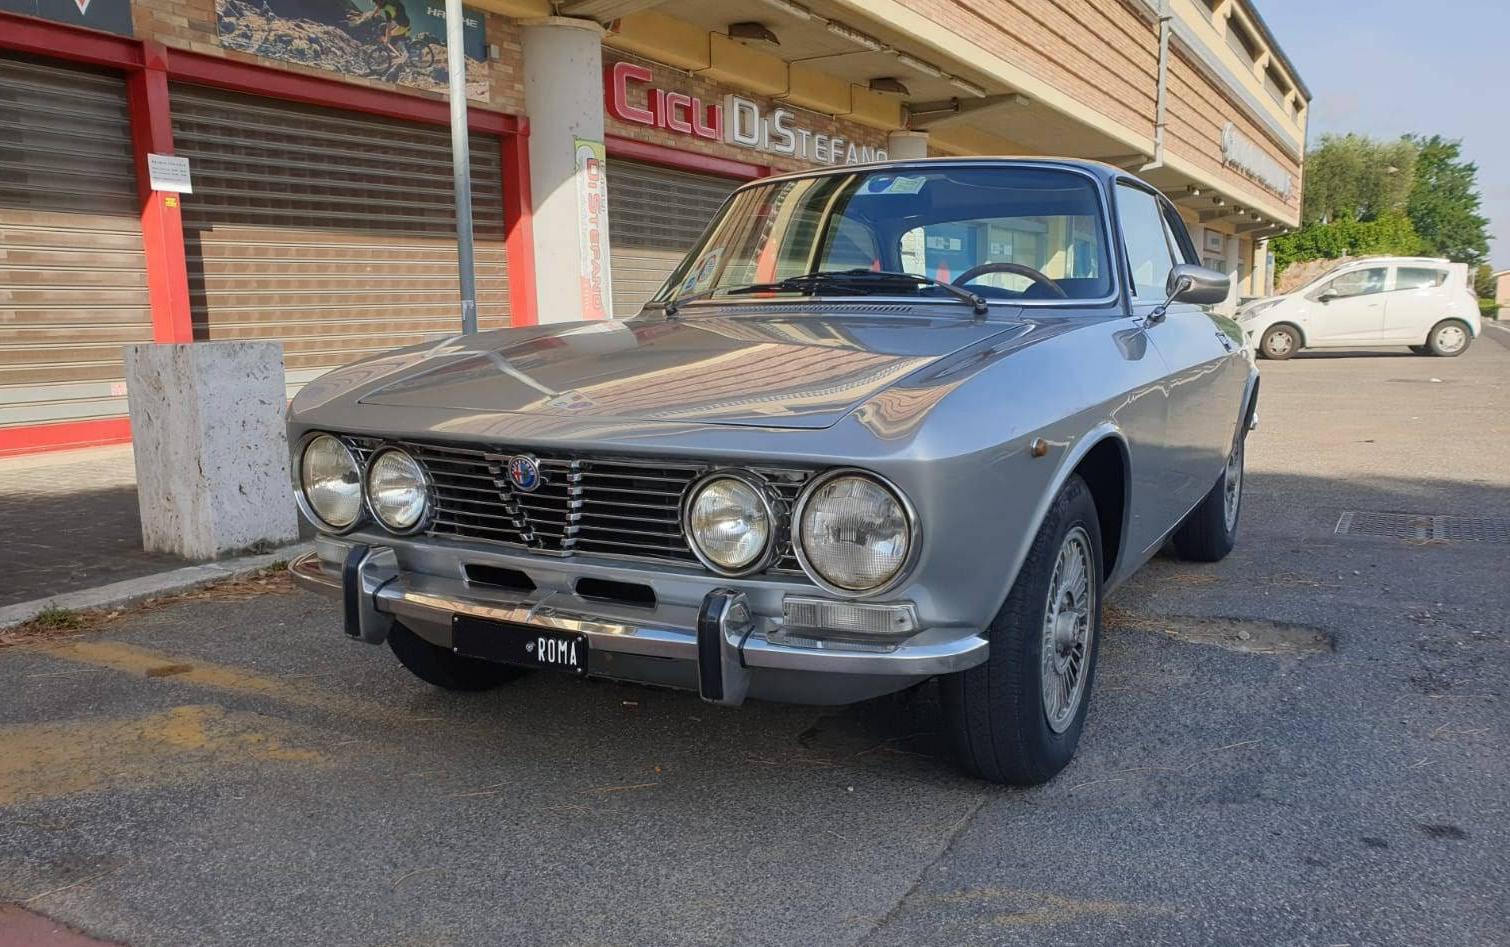 1972 Alfa Romeo 2000 GT Veloce 1973 For Sale (picture 1 of 6)